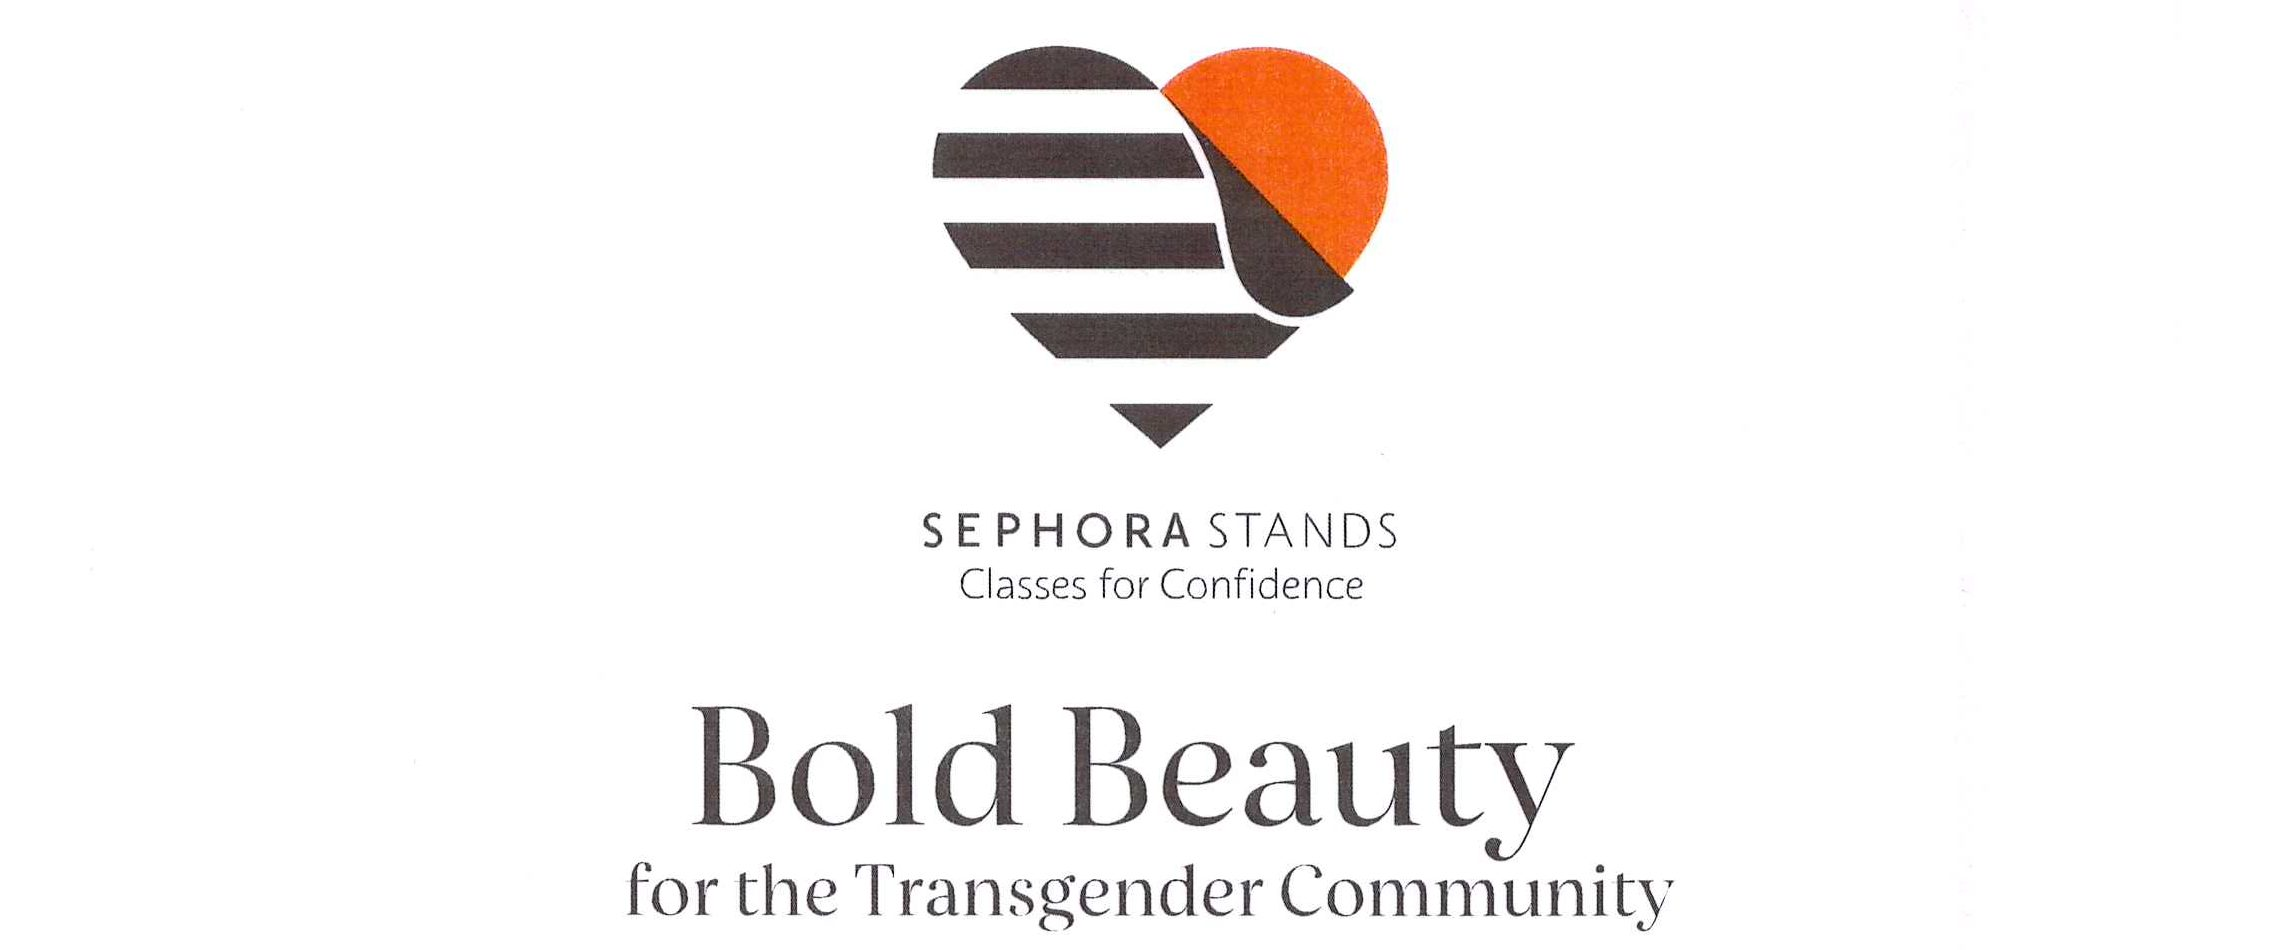 bold beauty